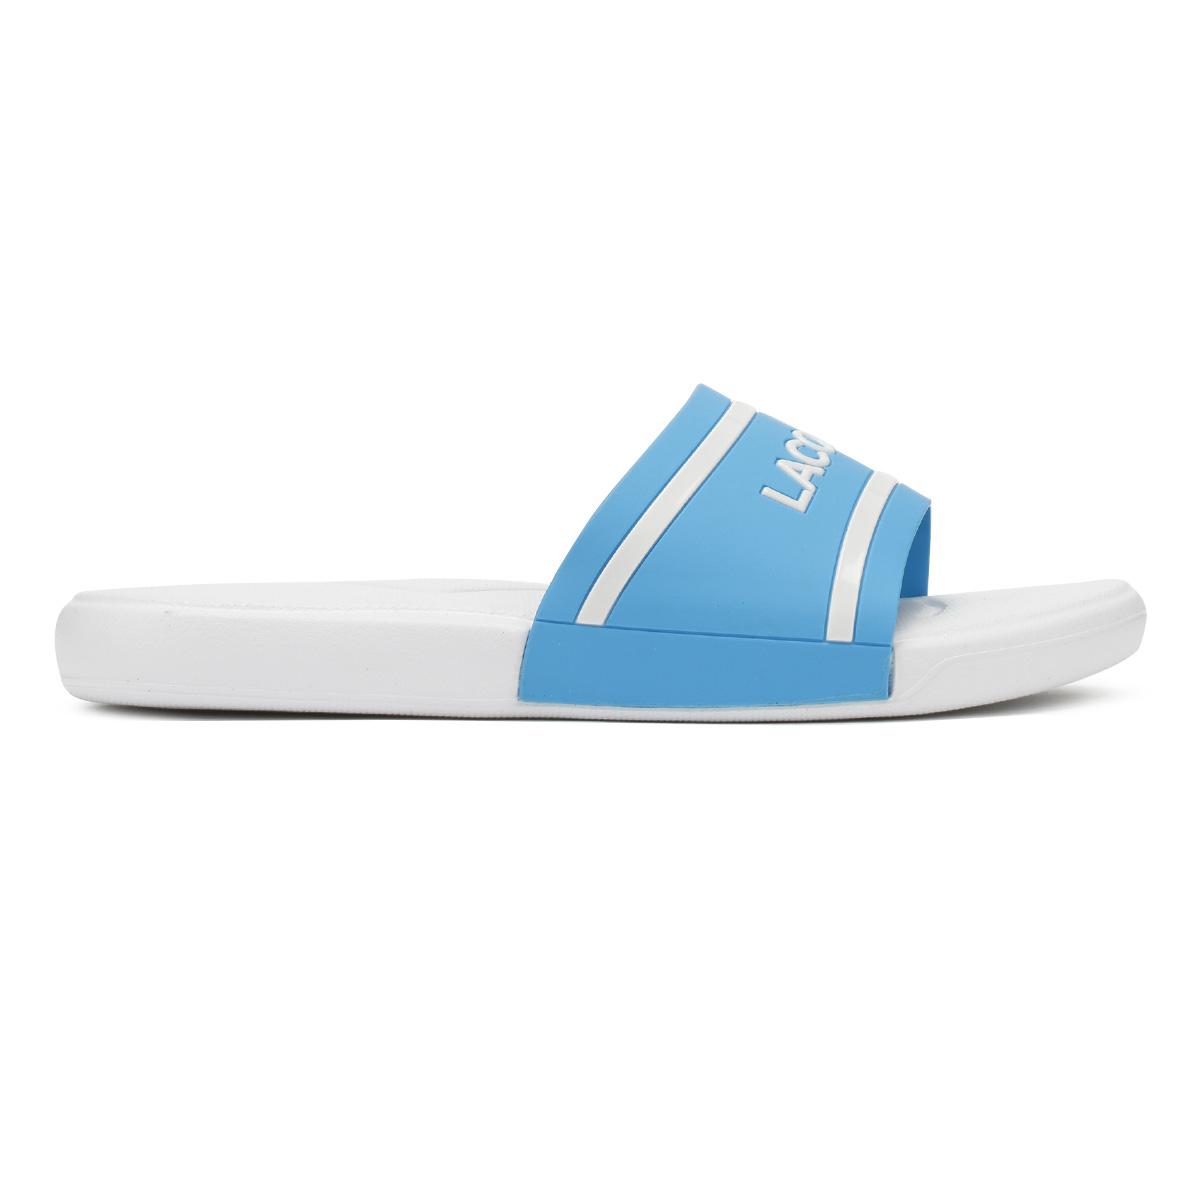 2f10ed6a4 Lacoste Junior Blue   White L.30 118 2 Slides Kids Casual Summer Beach Shoes